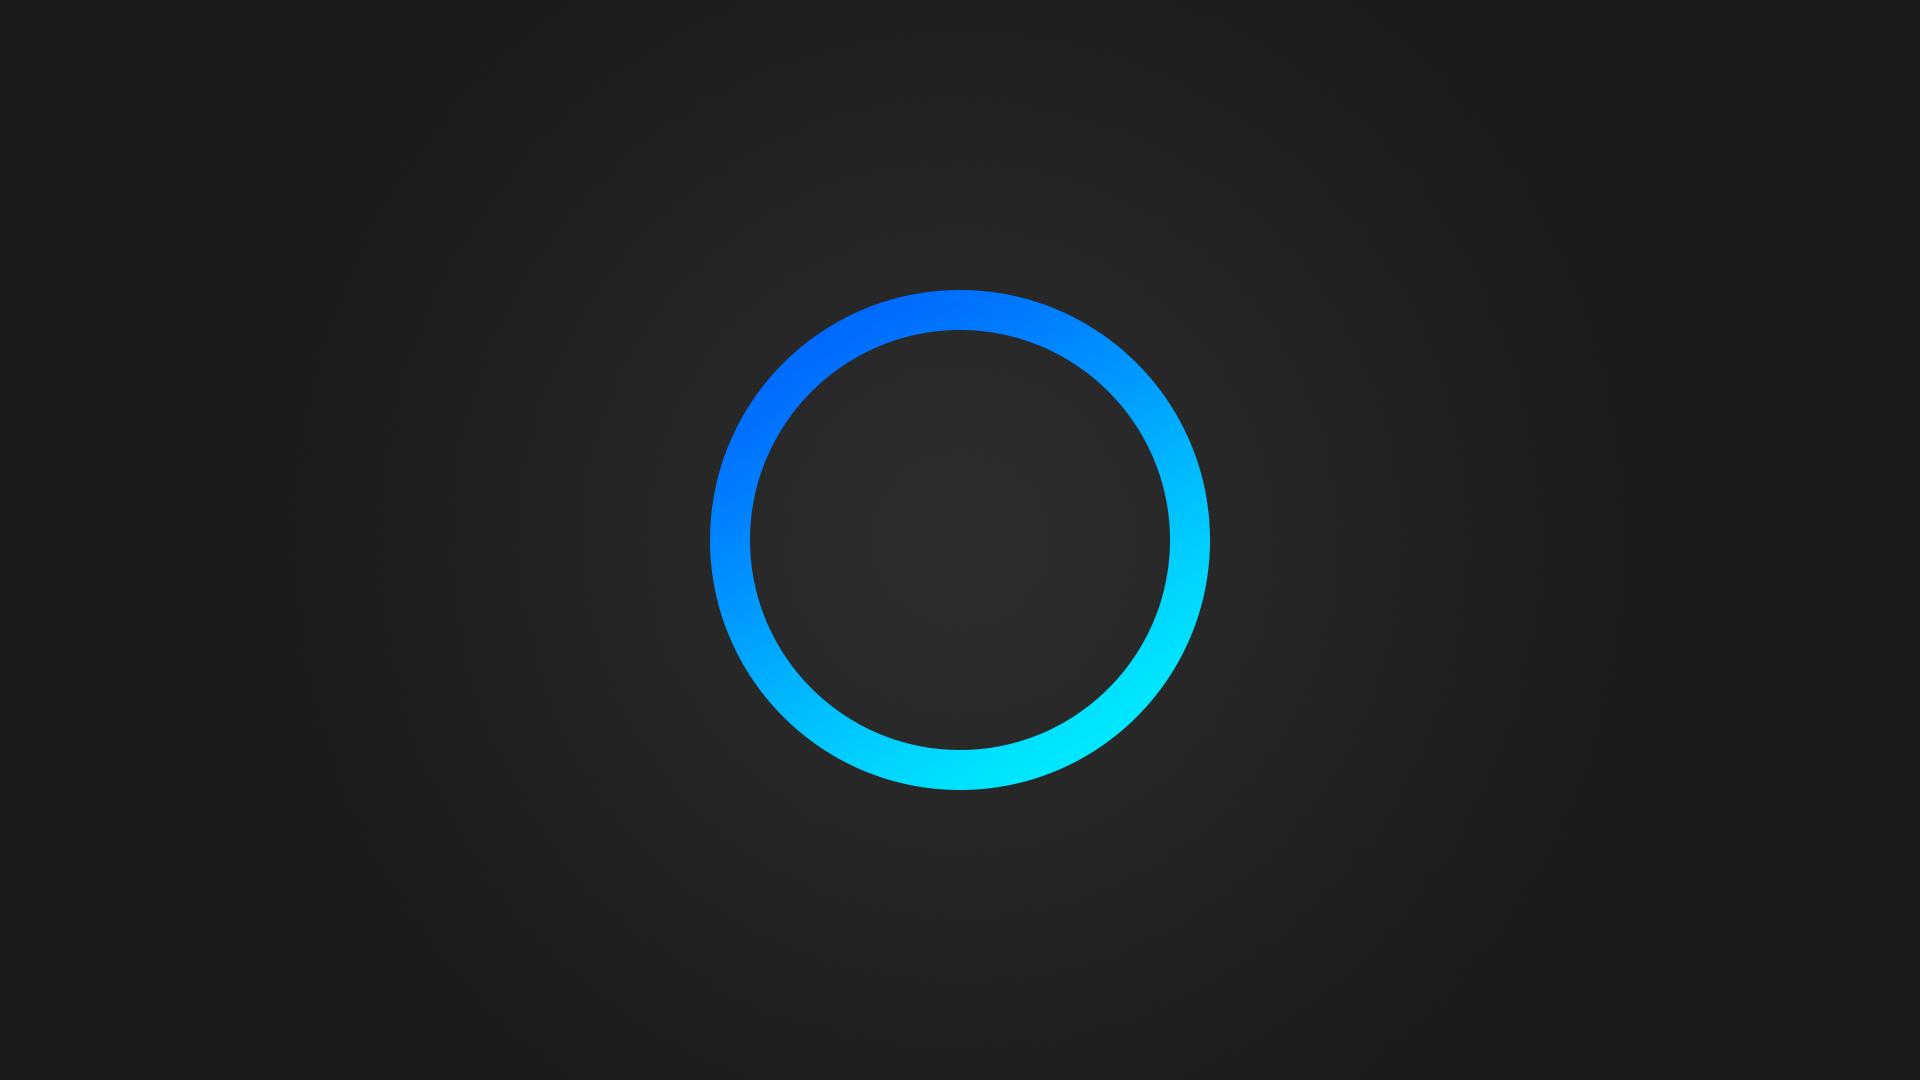 Text Logo Blue Simple Circle Gray Background Brand Cortana Shape Line Symbol Number Screenshot Computer Wallpaper